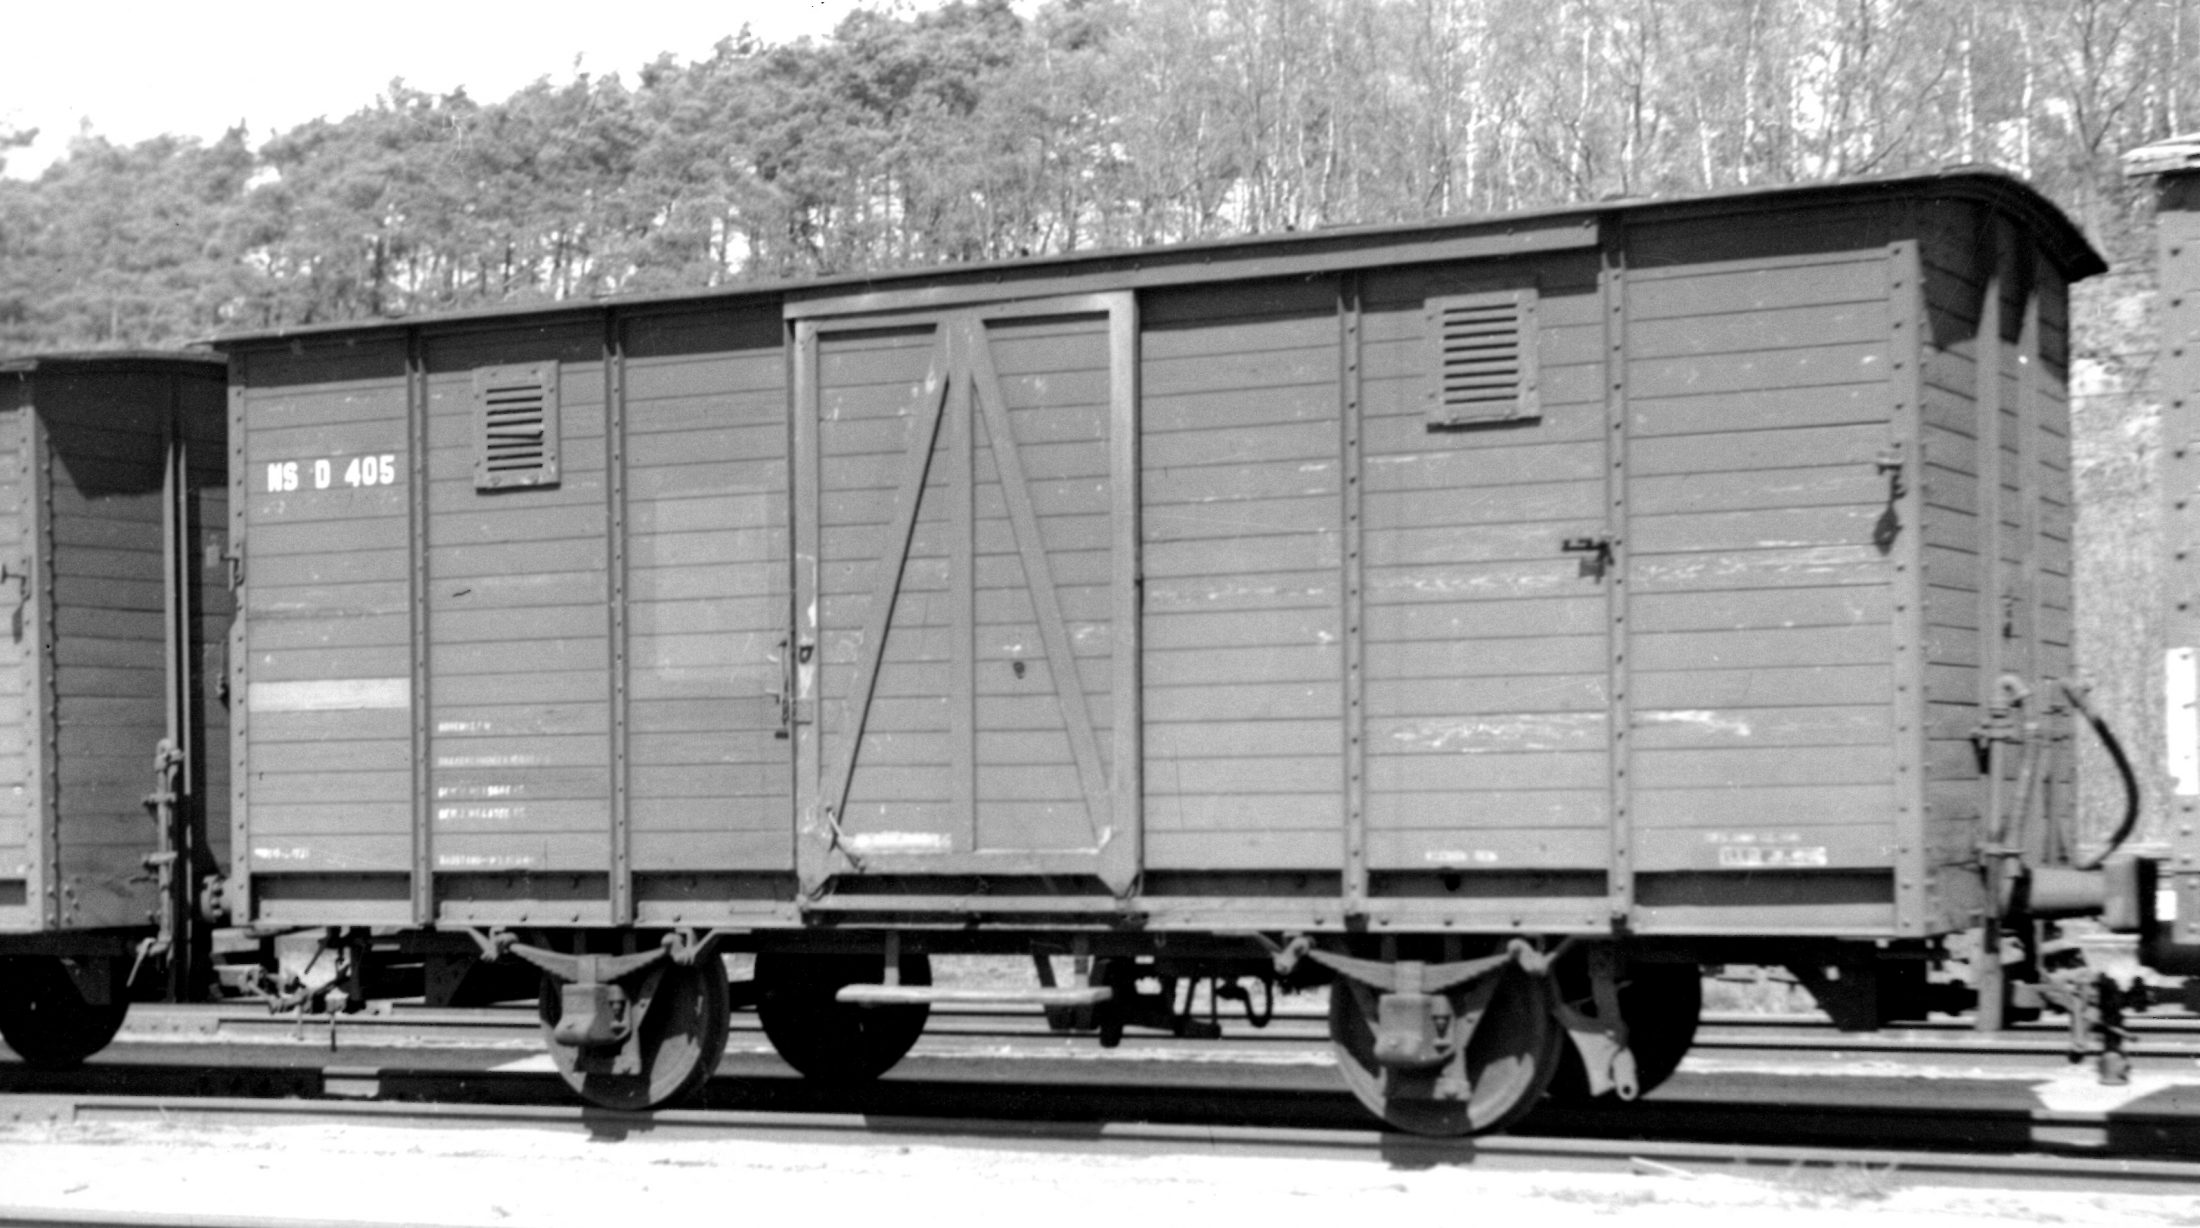 NS Dt 406